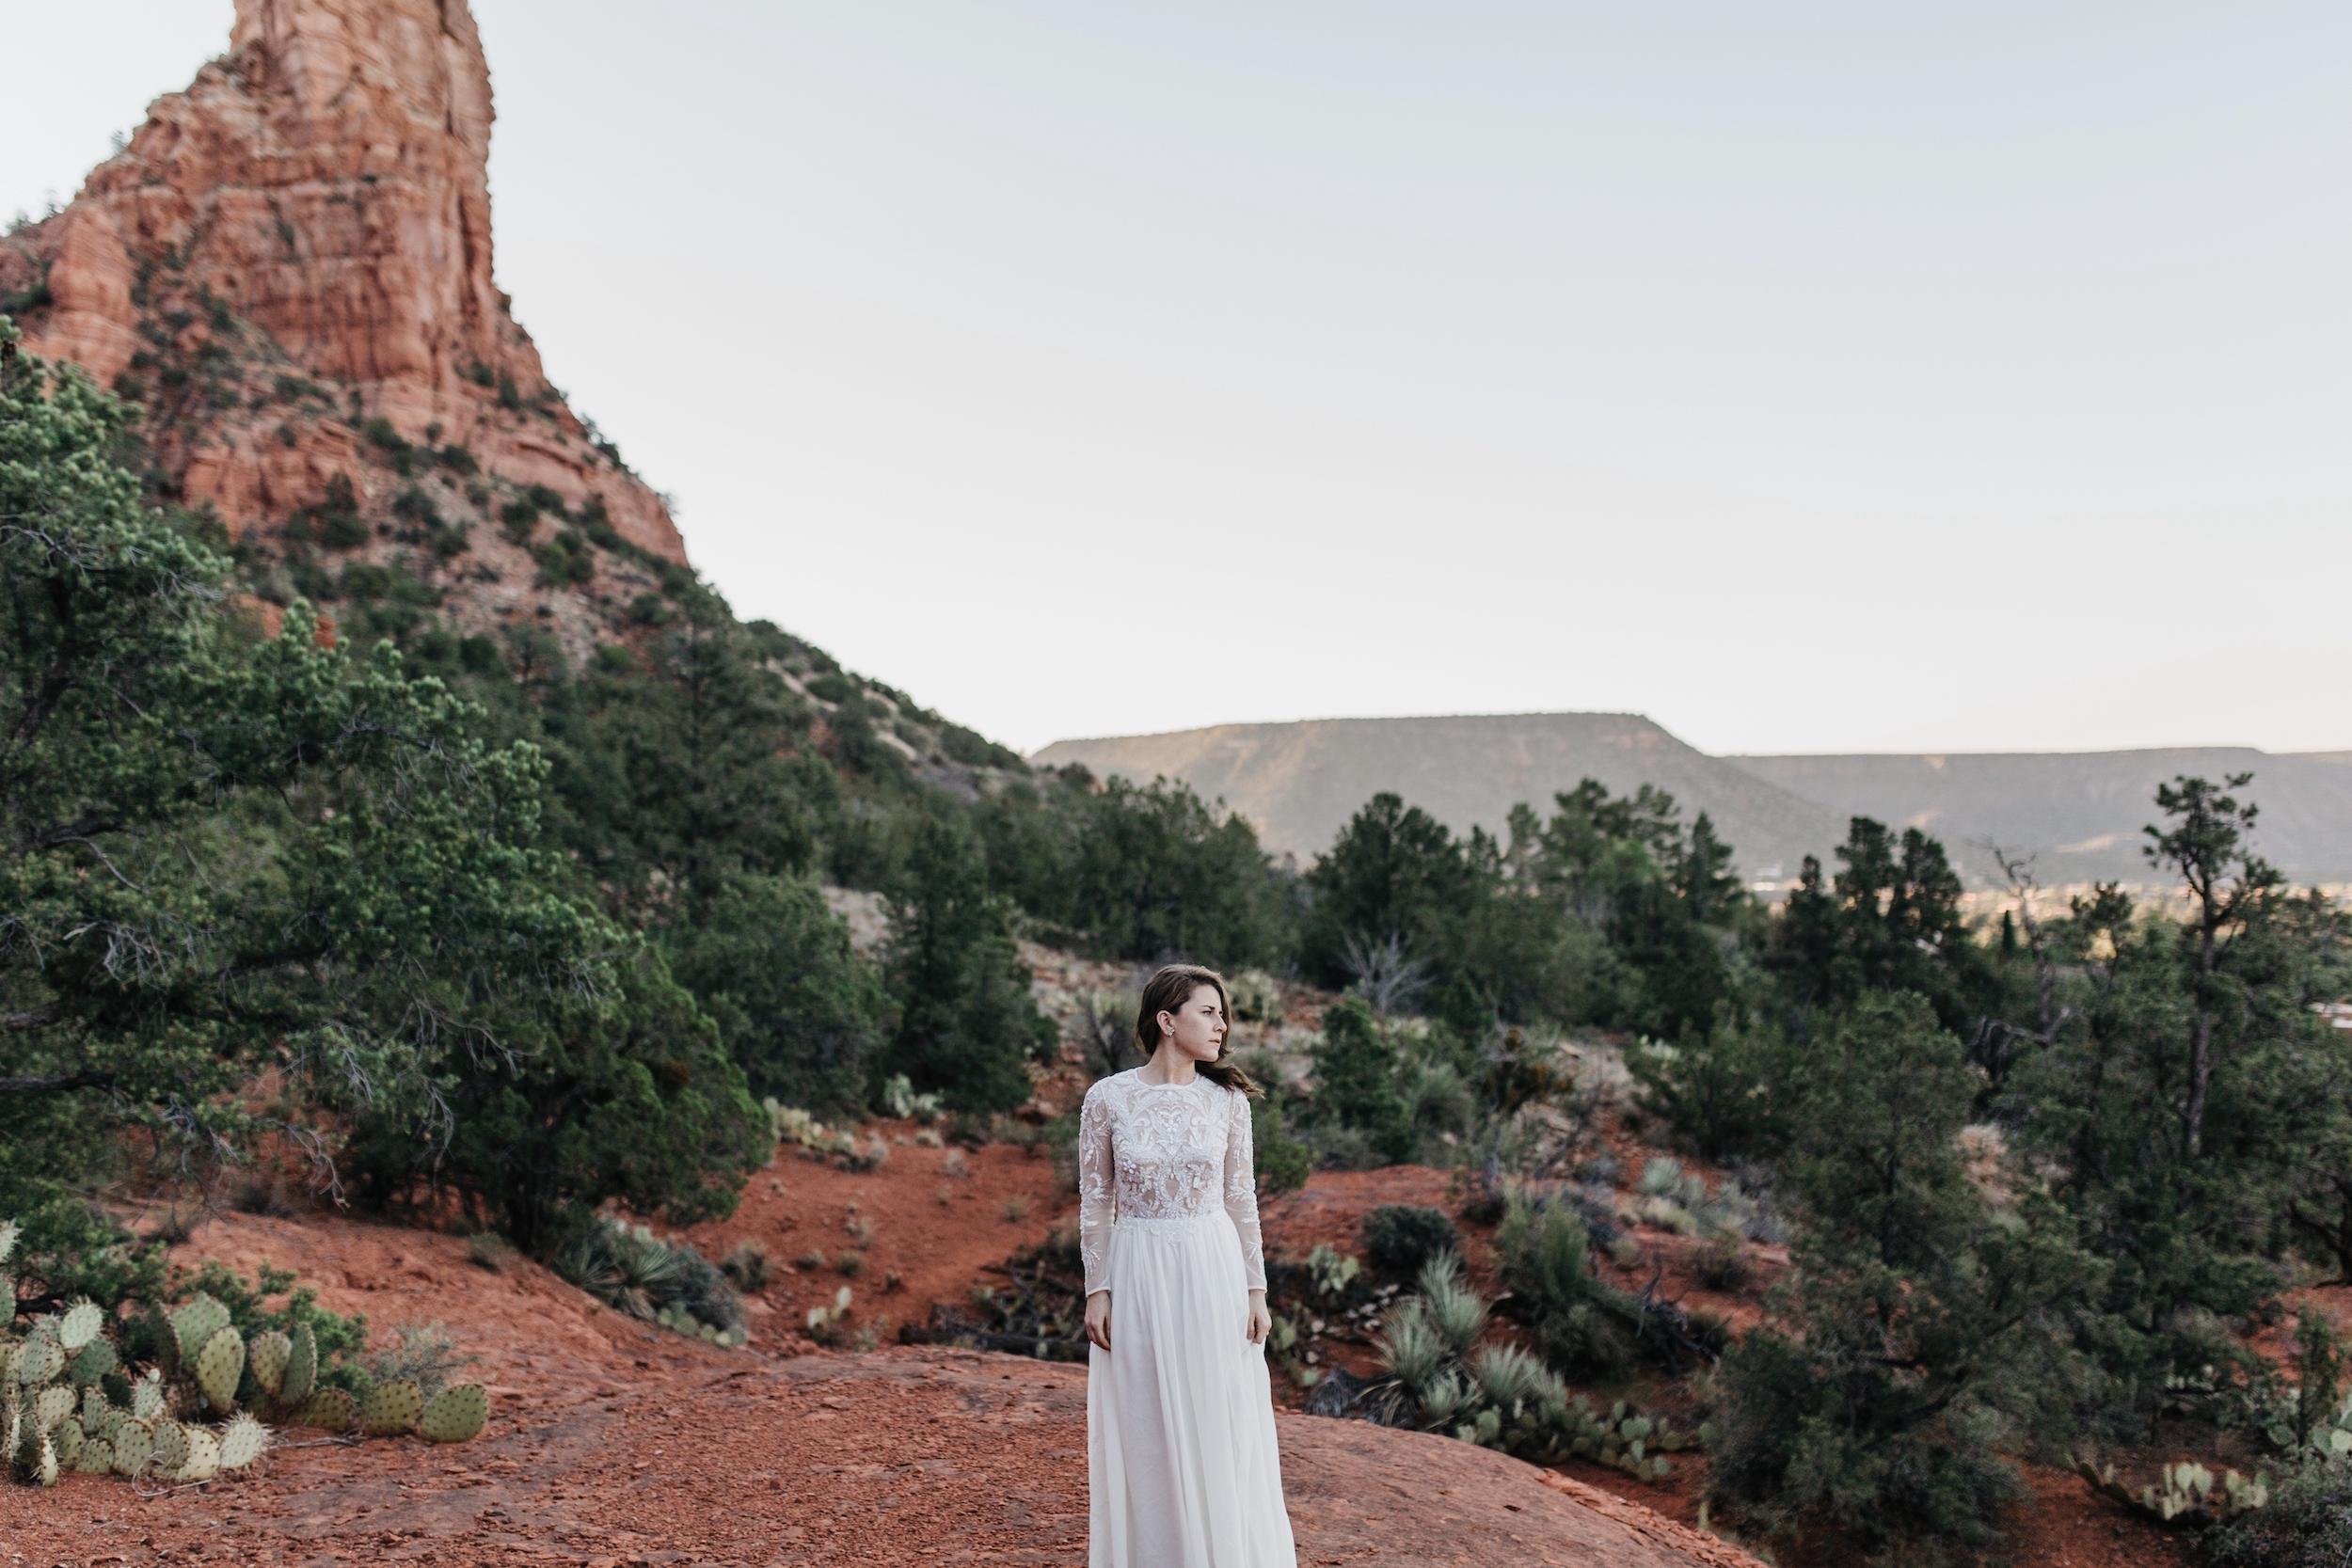 sedona - wedding - photographer 0011.jpg